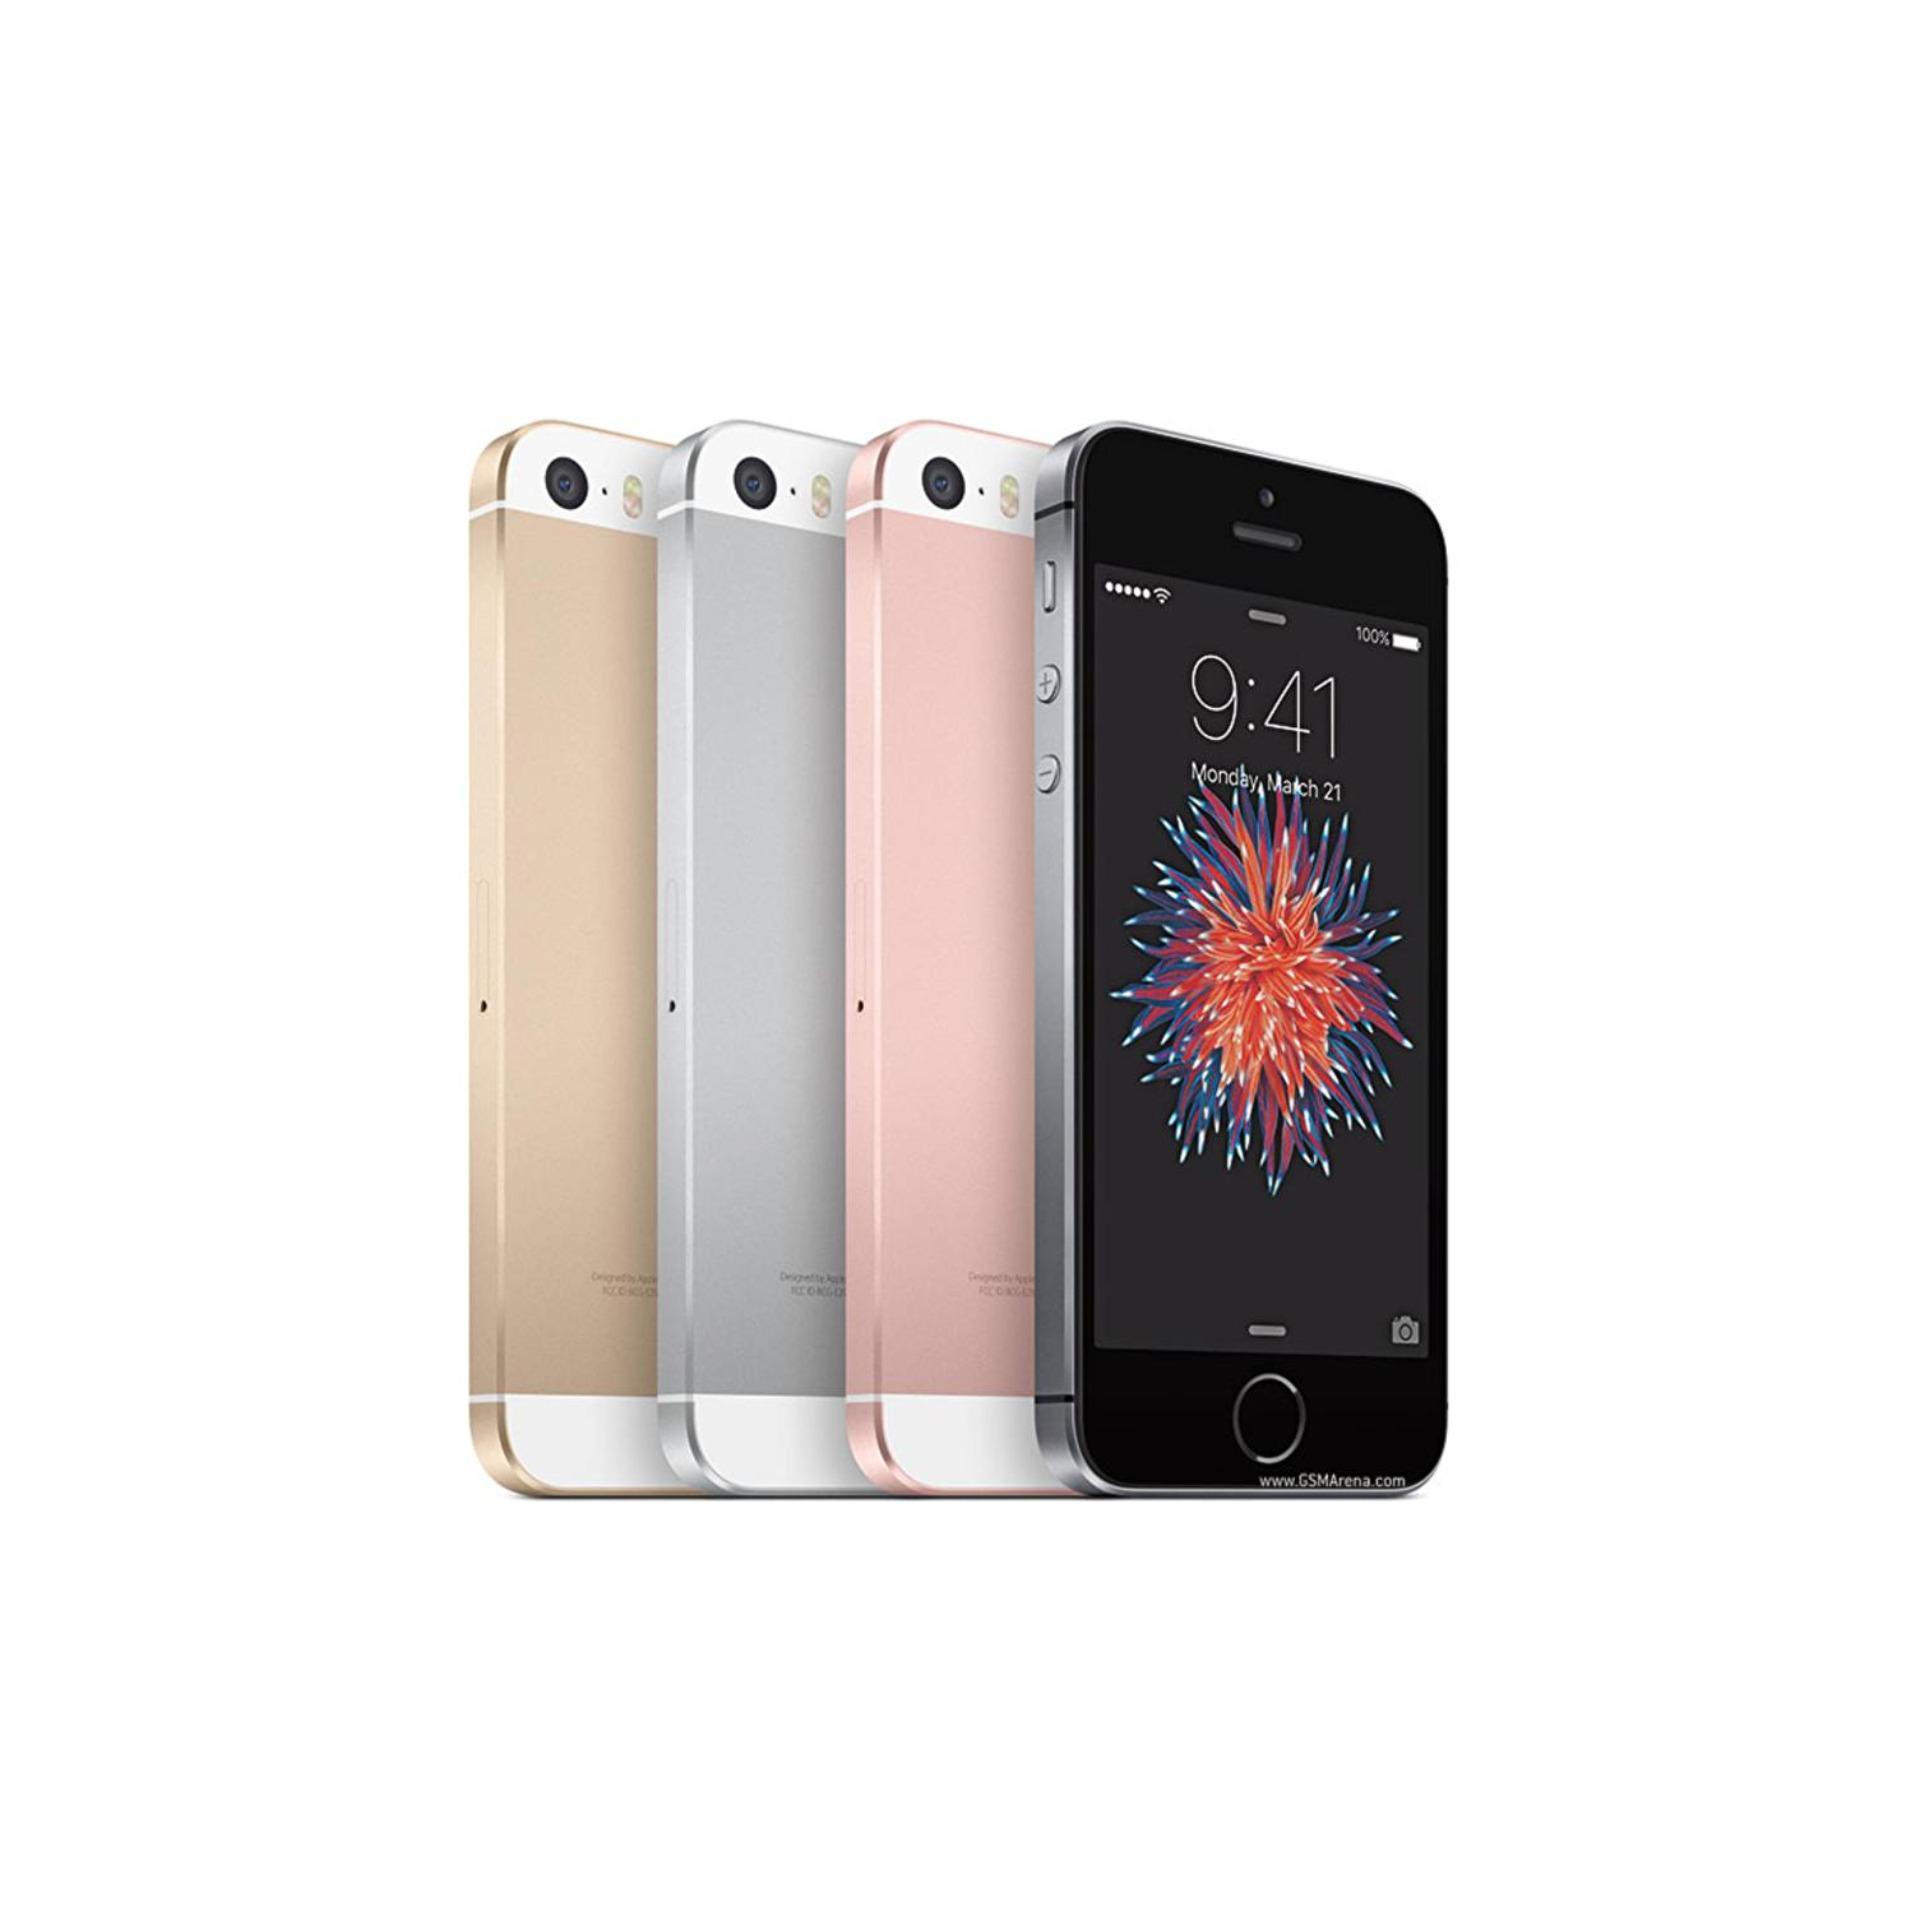 Promo Apple Iphone 5s 64gb Silver Garansi Internasional Jual 5 1 Tahun New Se 32gb Resmi Best Seller